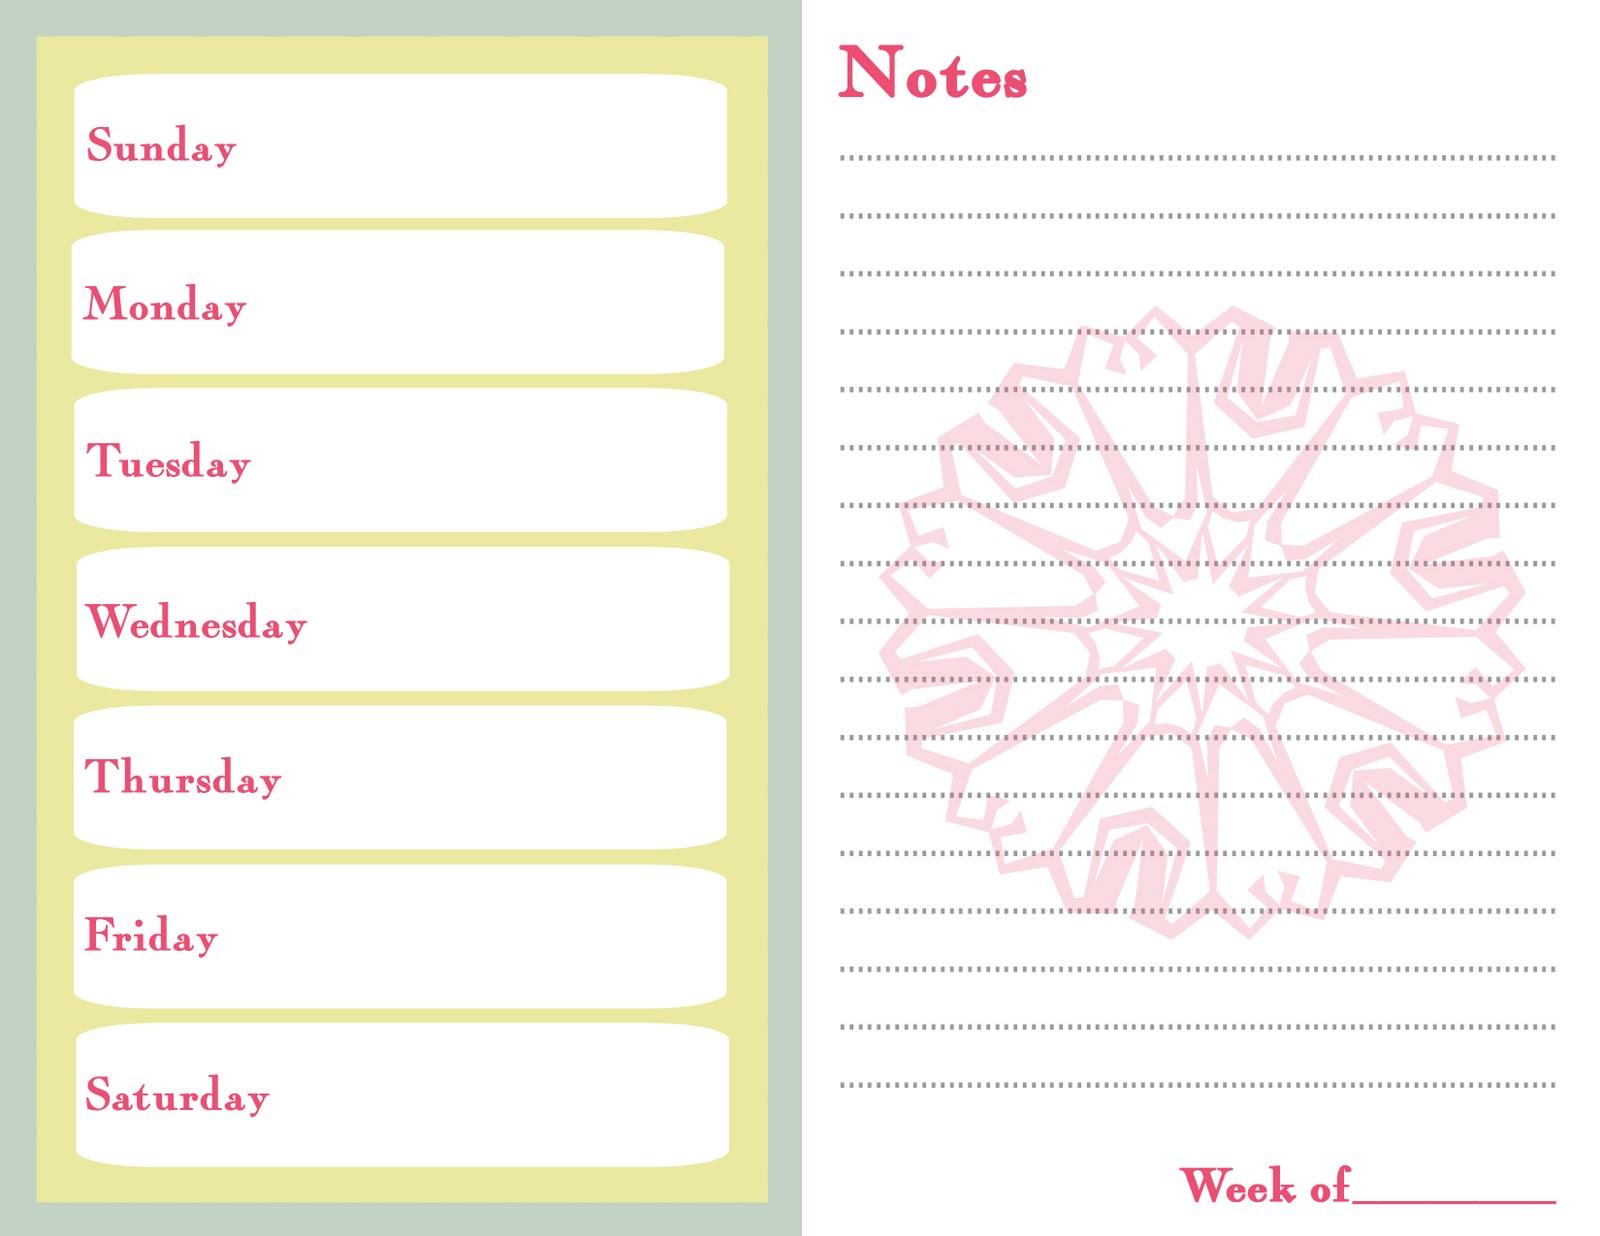 camping menu planner template - 7 day menu planner template